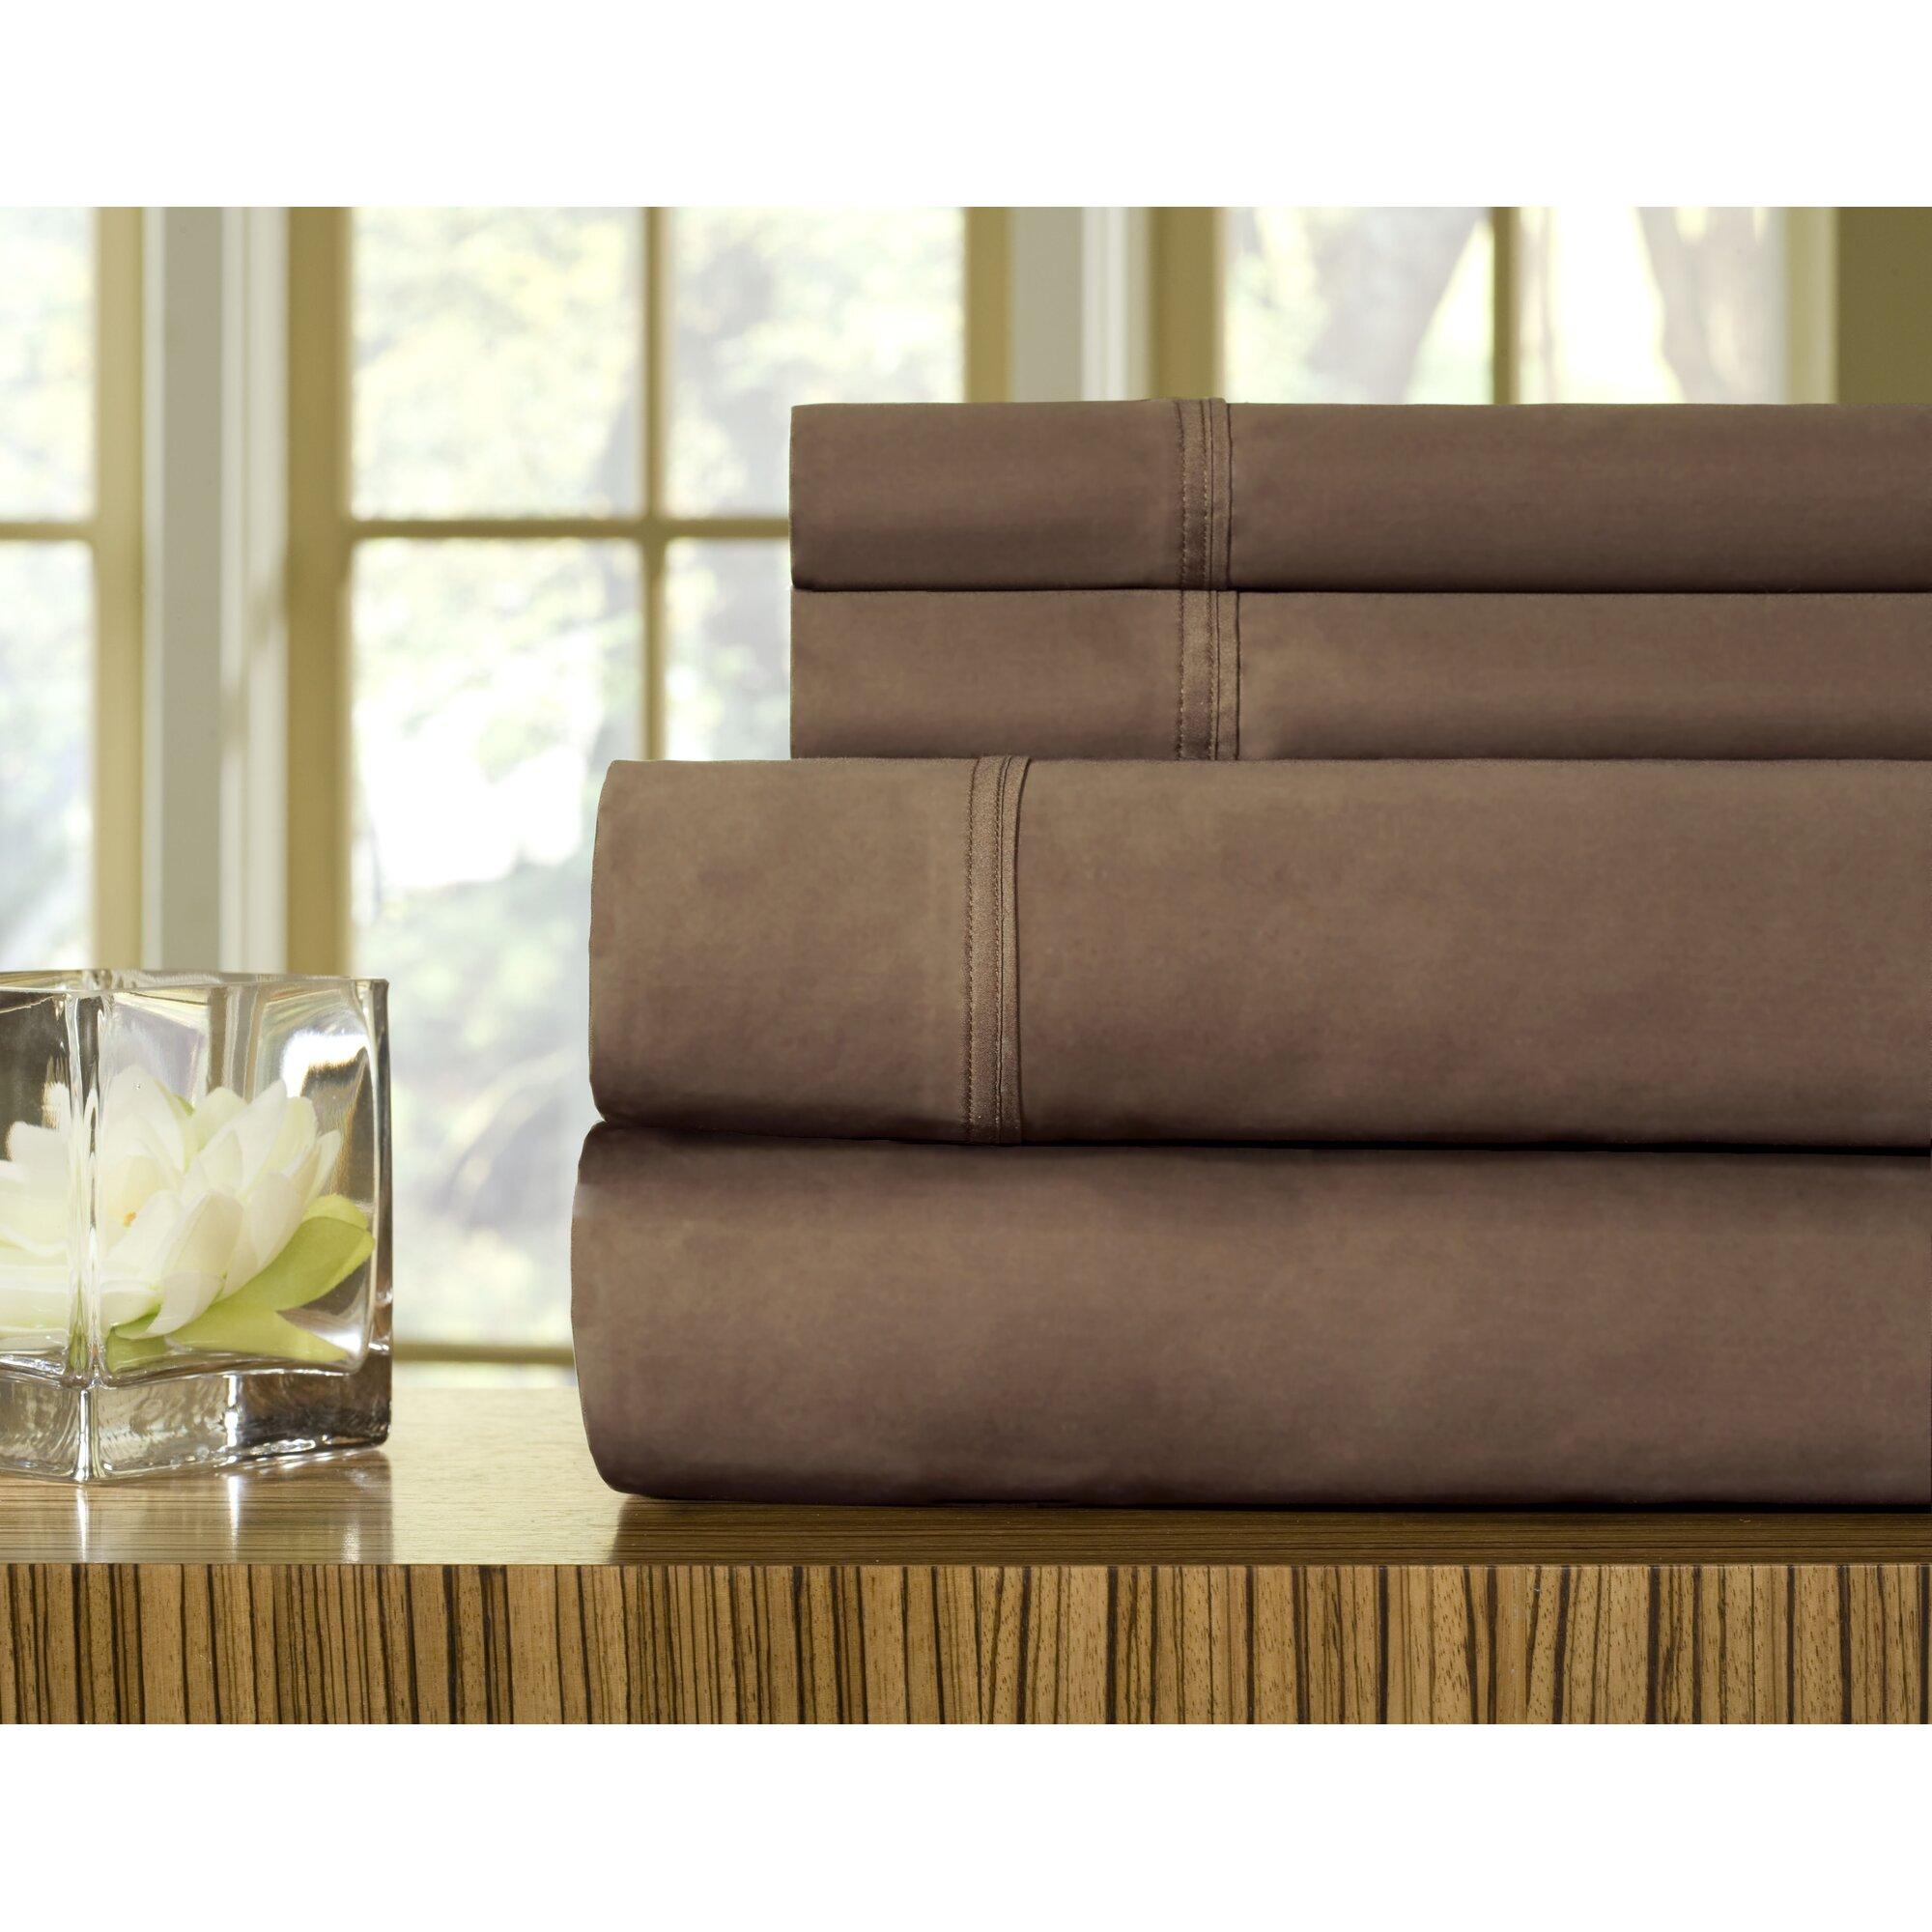 celeste home 510 thread count egyptian quality cotton sheet set reviews wayfair. Black Bedroom Furniture Sets. Home Design Ideas